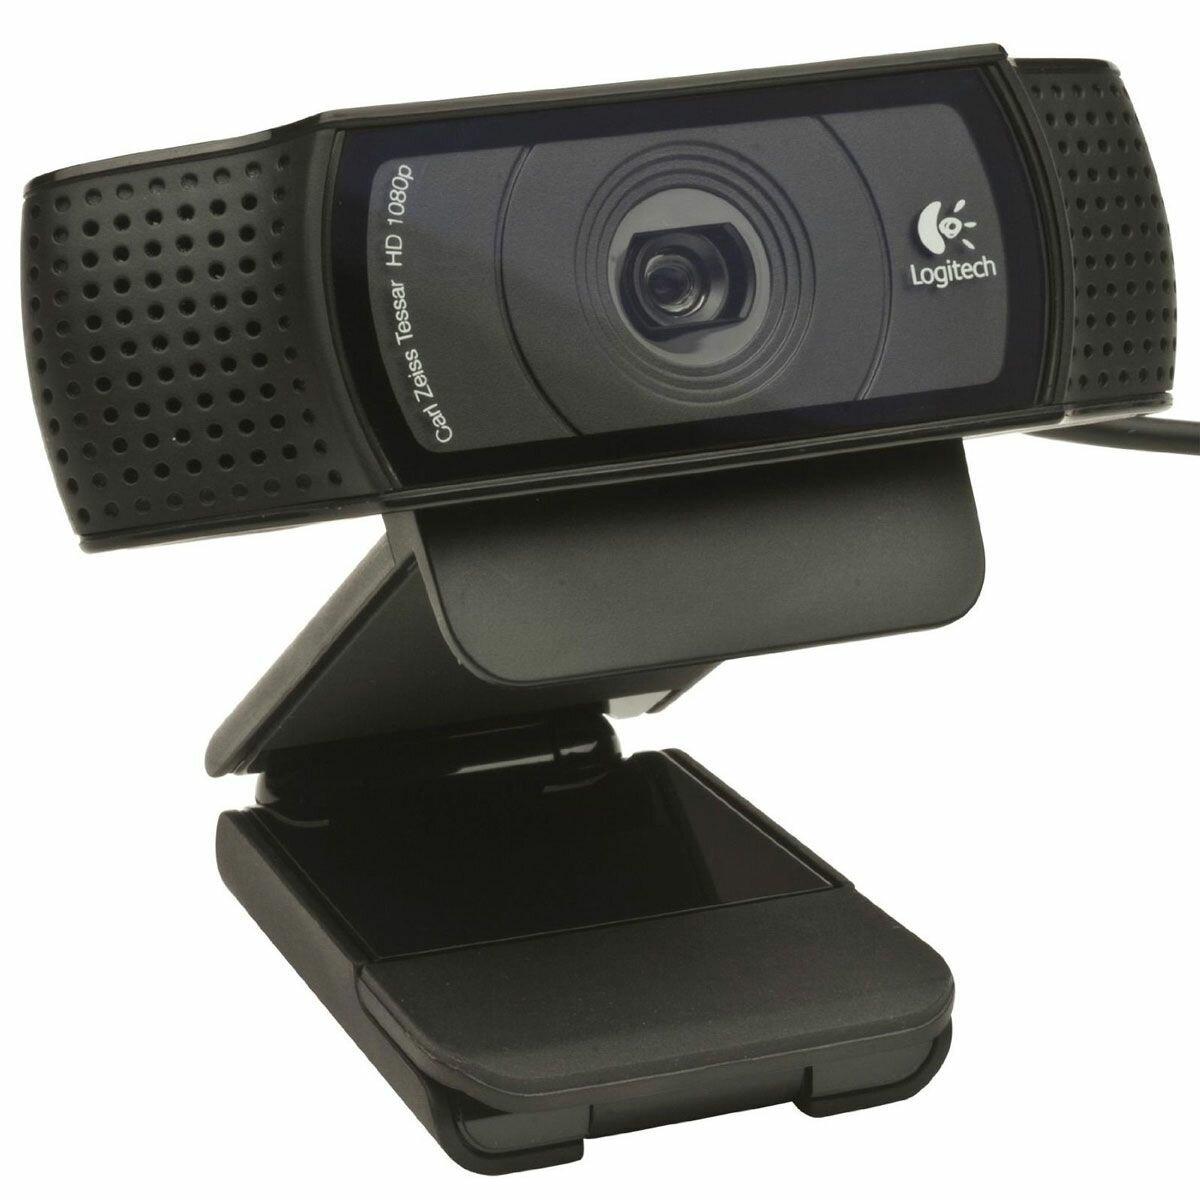 Web-камера Logitech HD Pro Webcam C920, Black